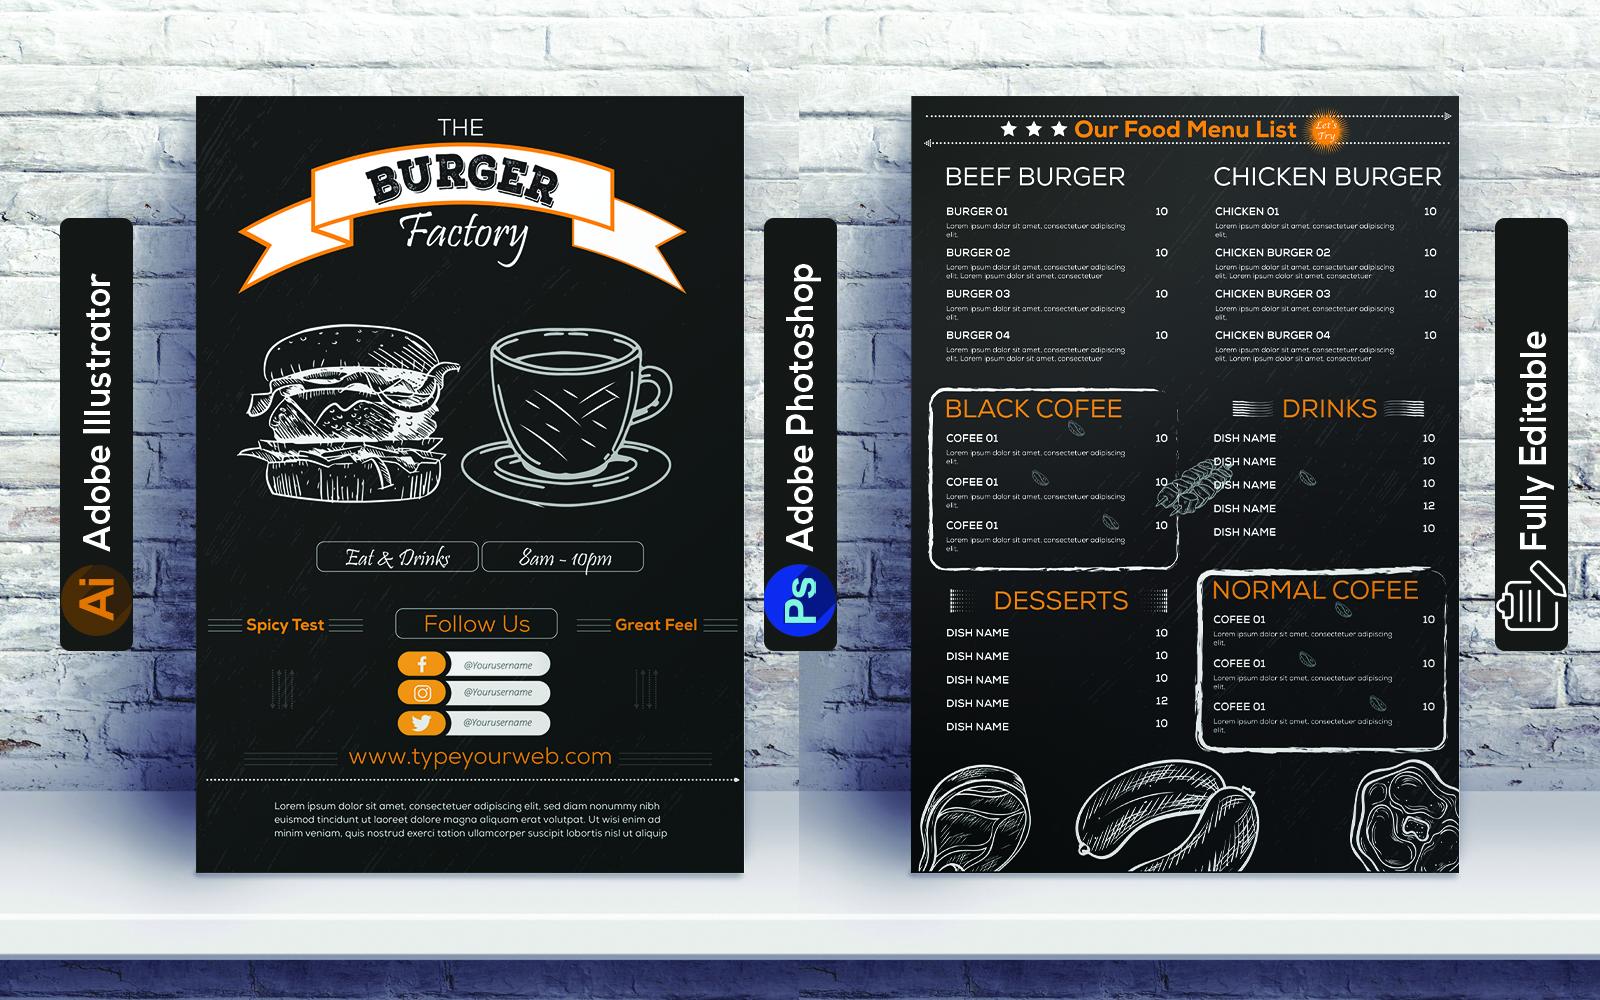 Restaurant Burger Menu design Corporate Identity Template